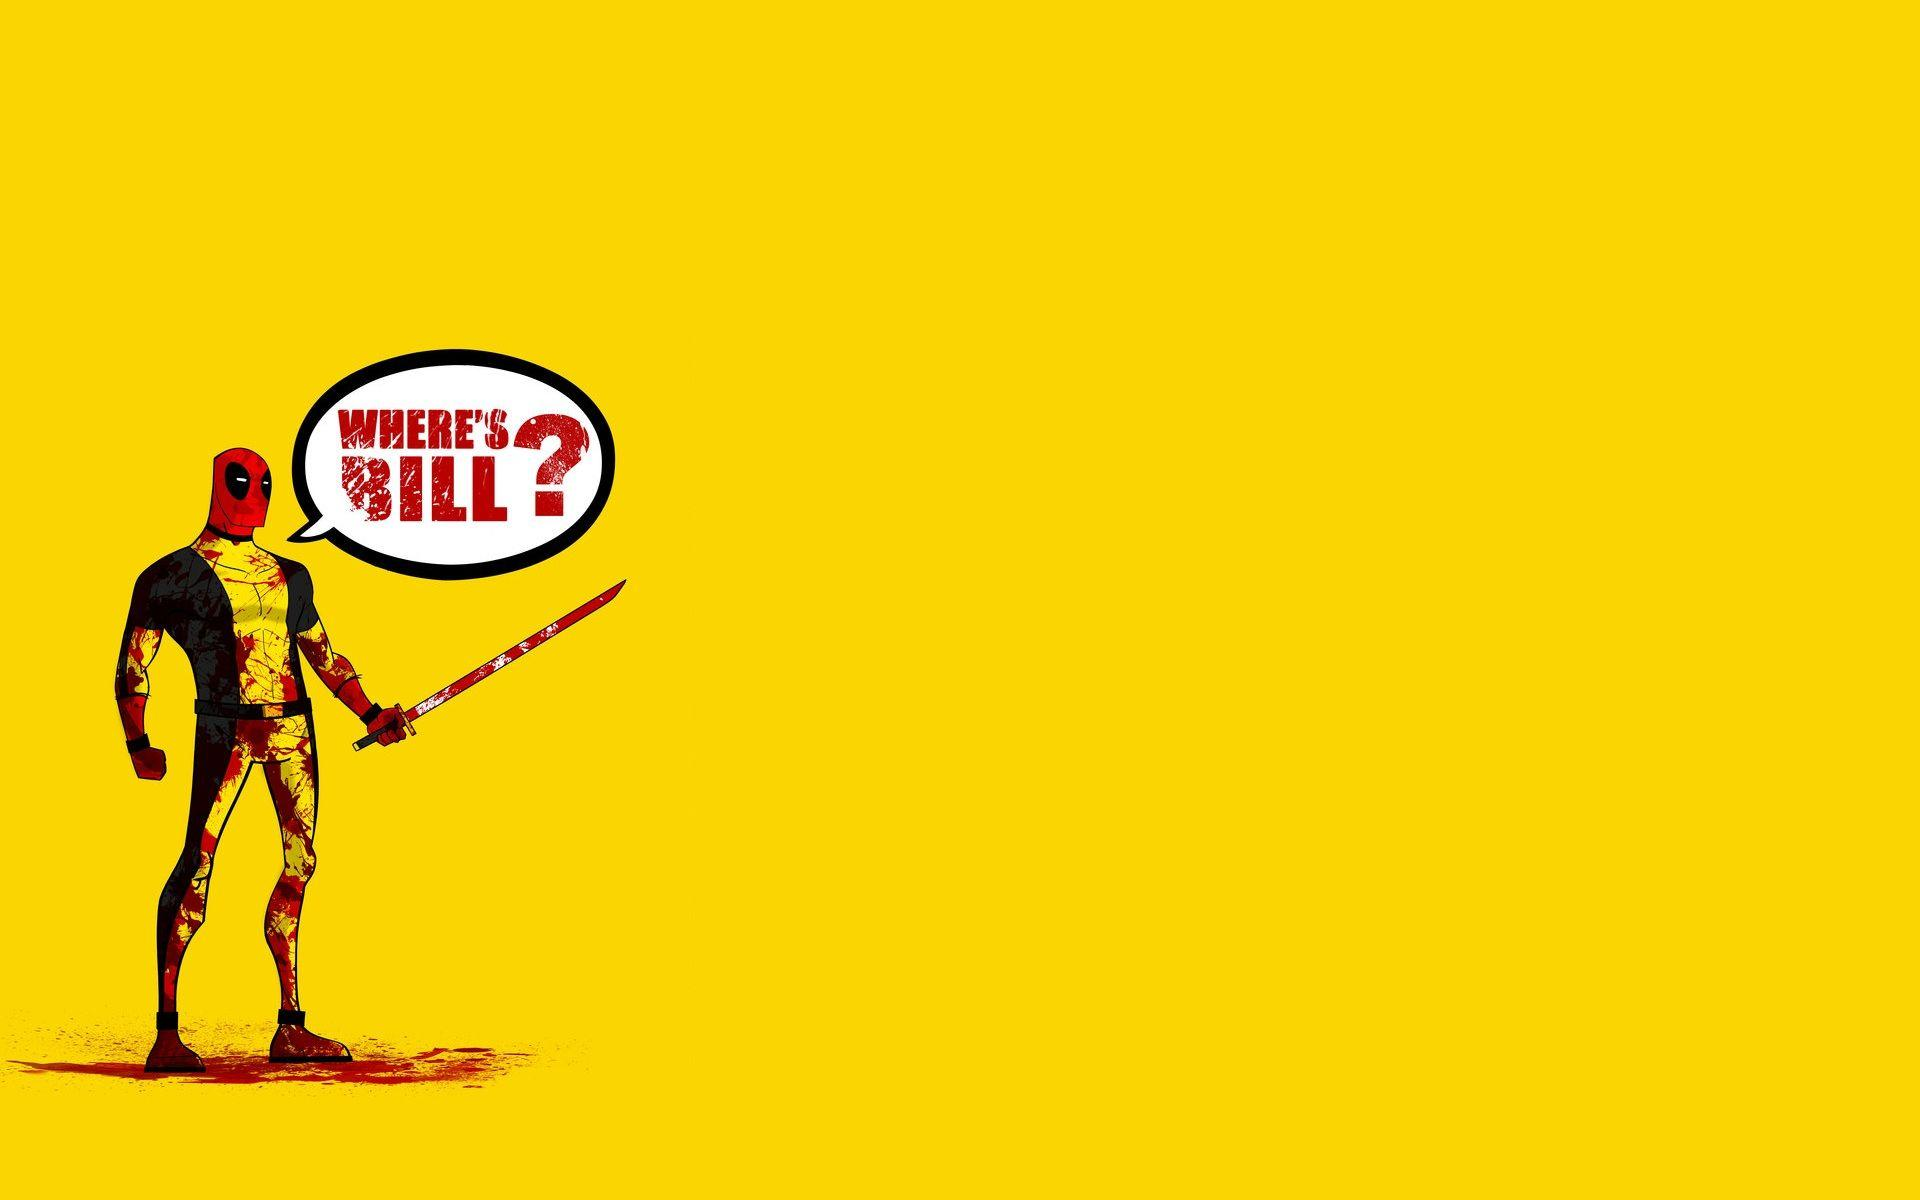 Gravity Falls Iphone 6 Wallpaper Kill Bill Wallpapers Wallpaper Cave